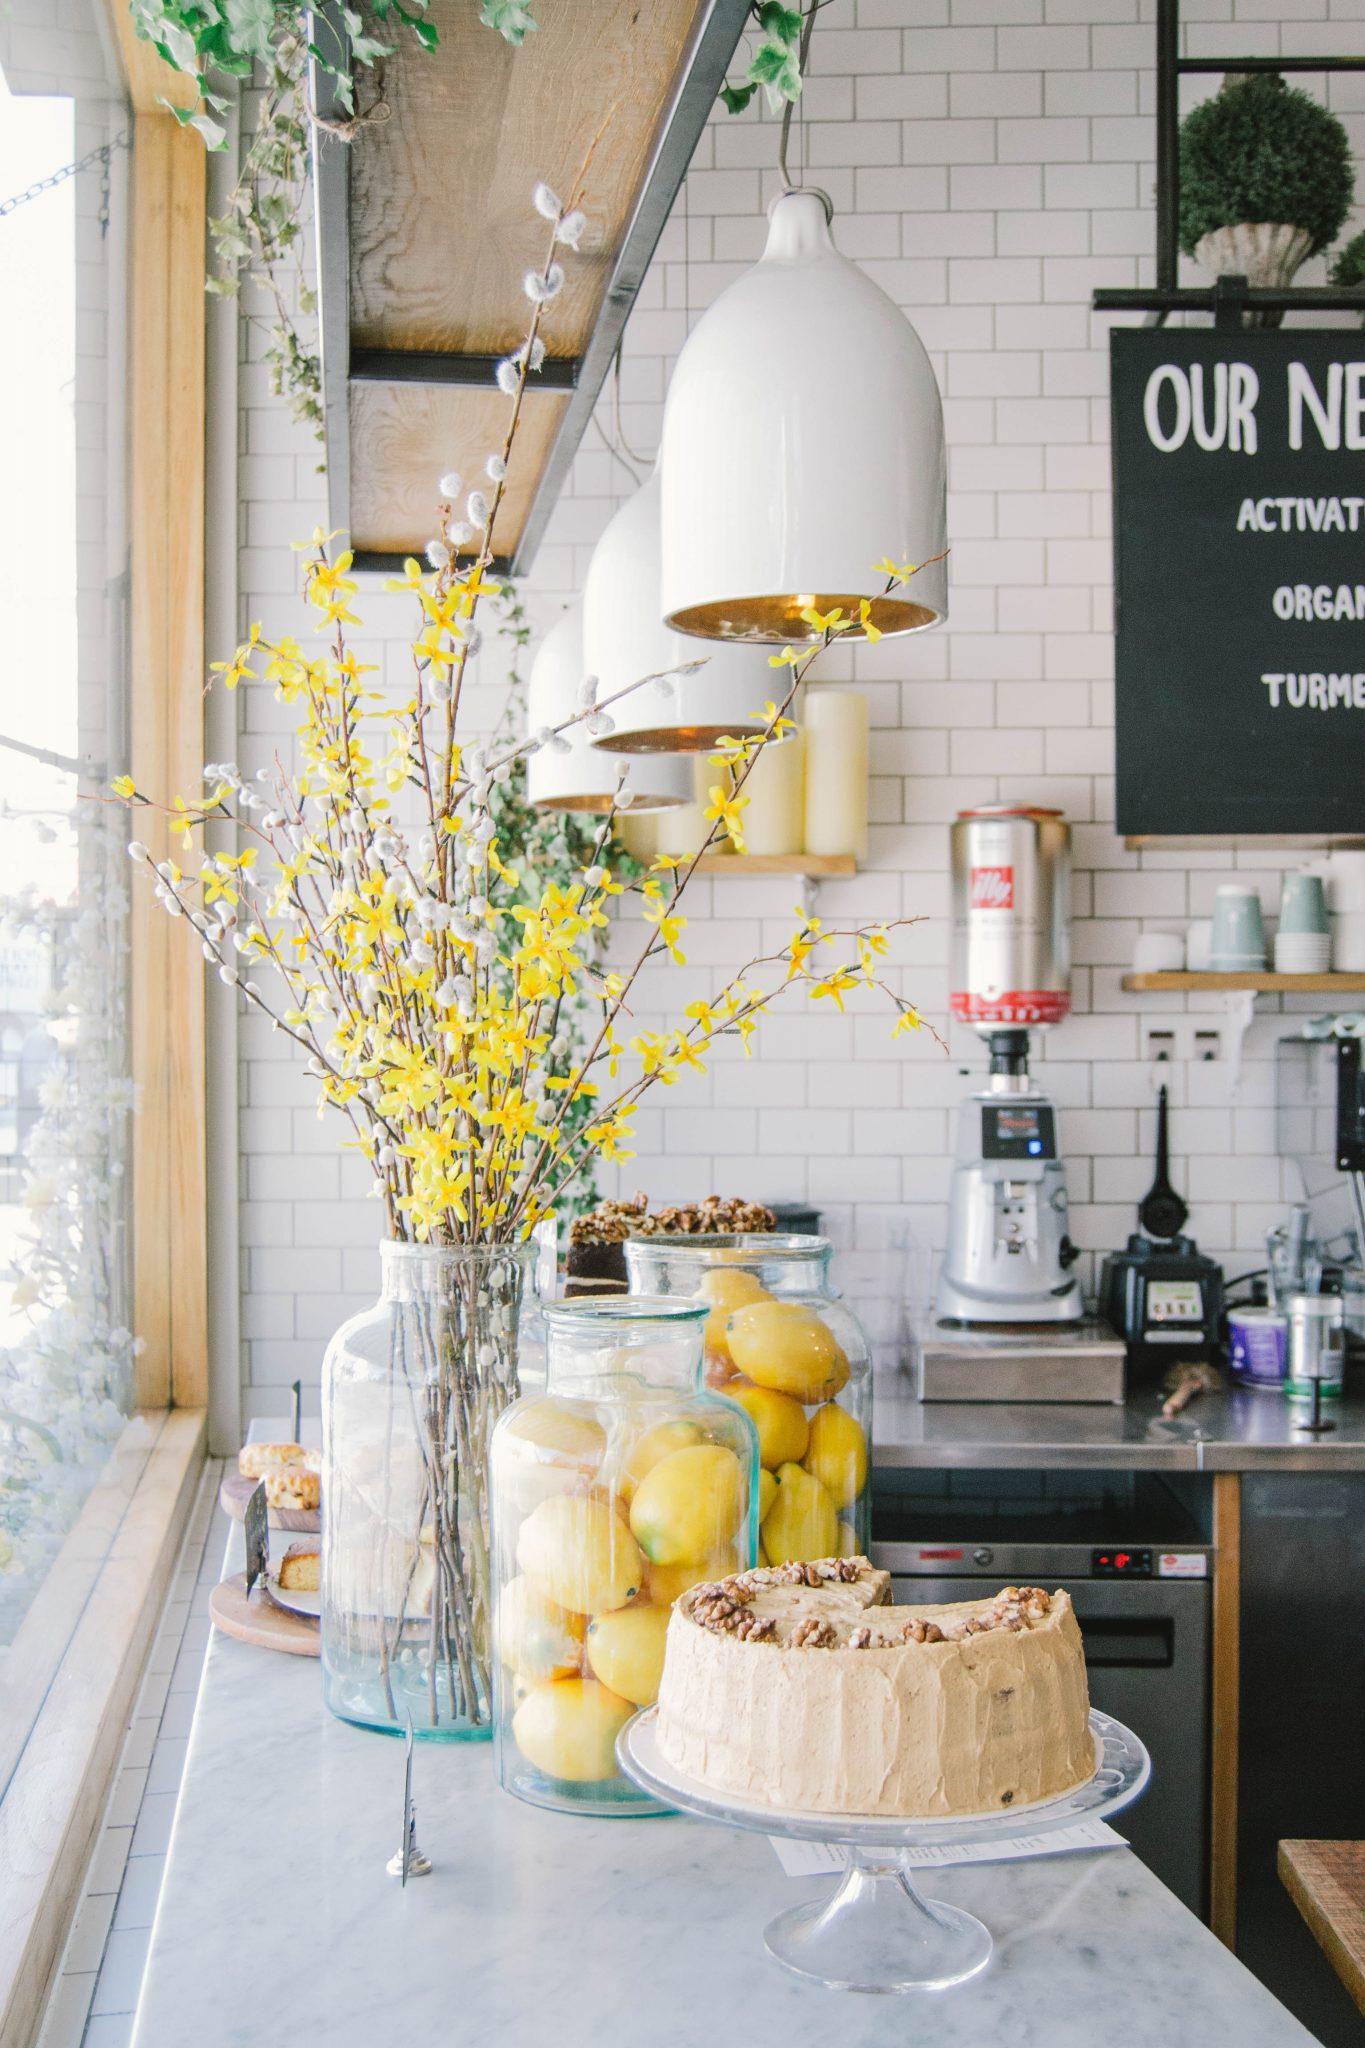 décor de comptoir de cuisine